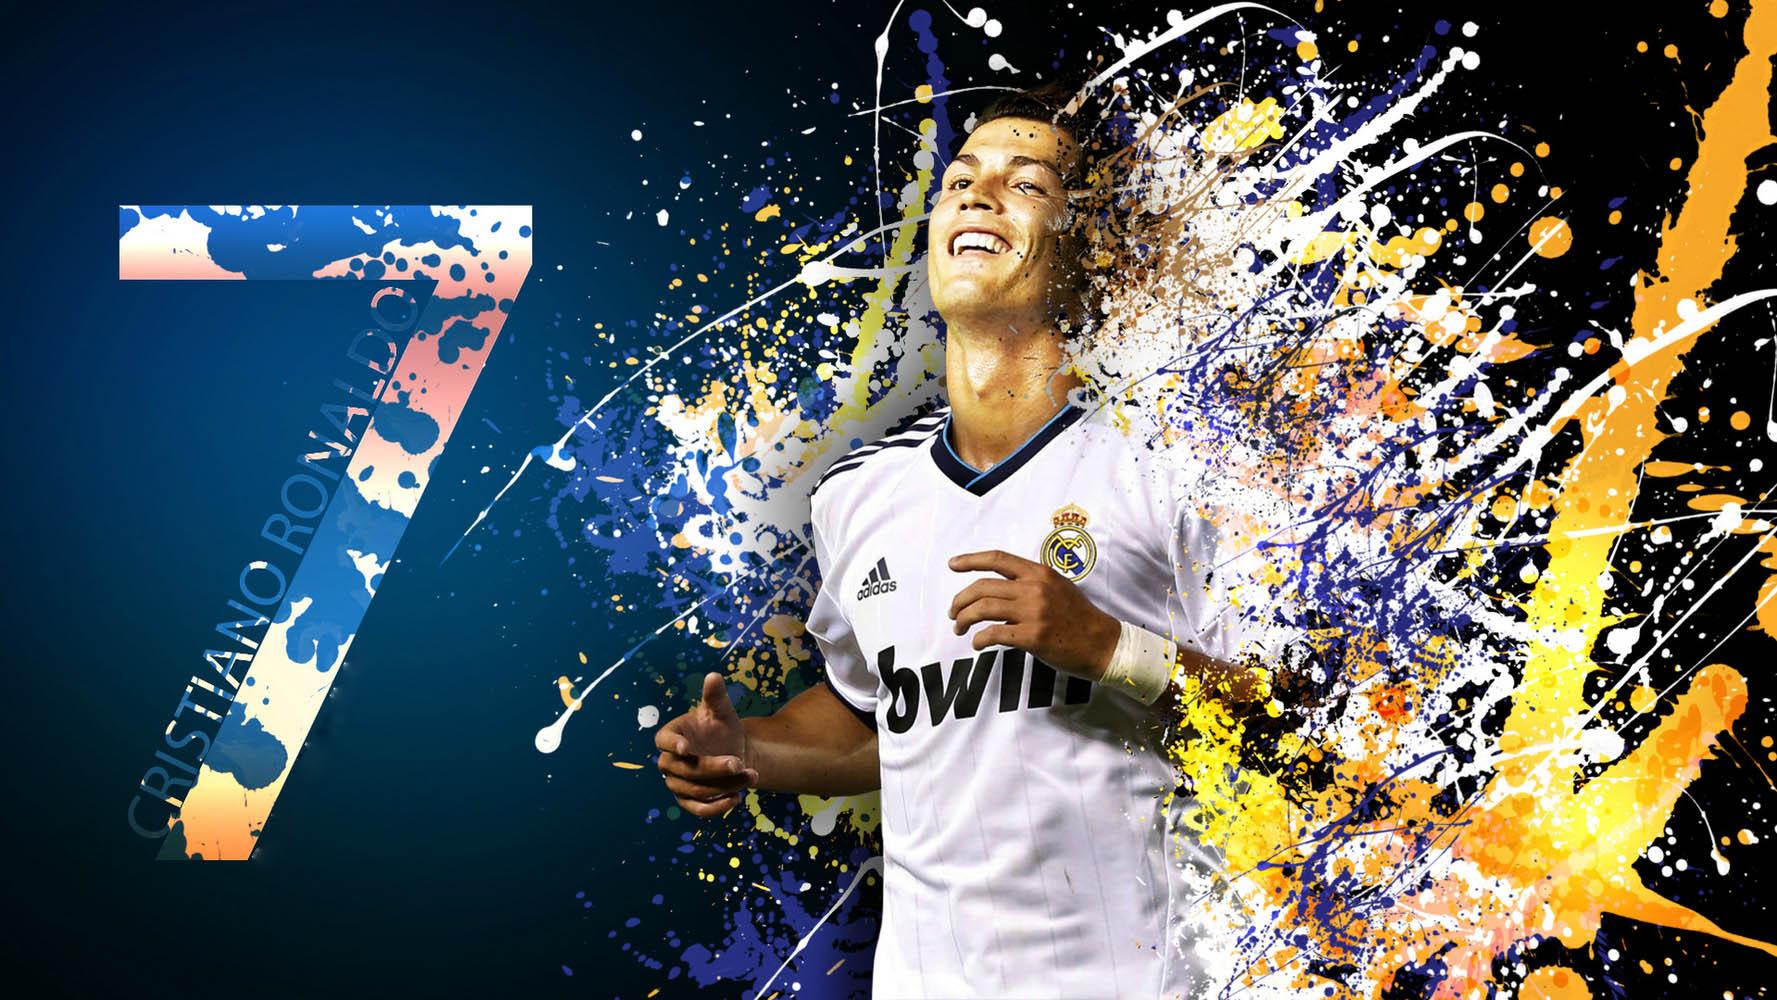 Cristiano Ronaldo Wallpapers 2013 HD 1777x1000